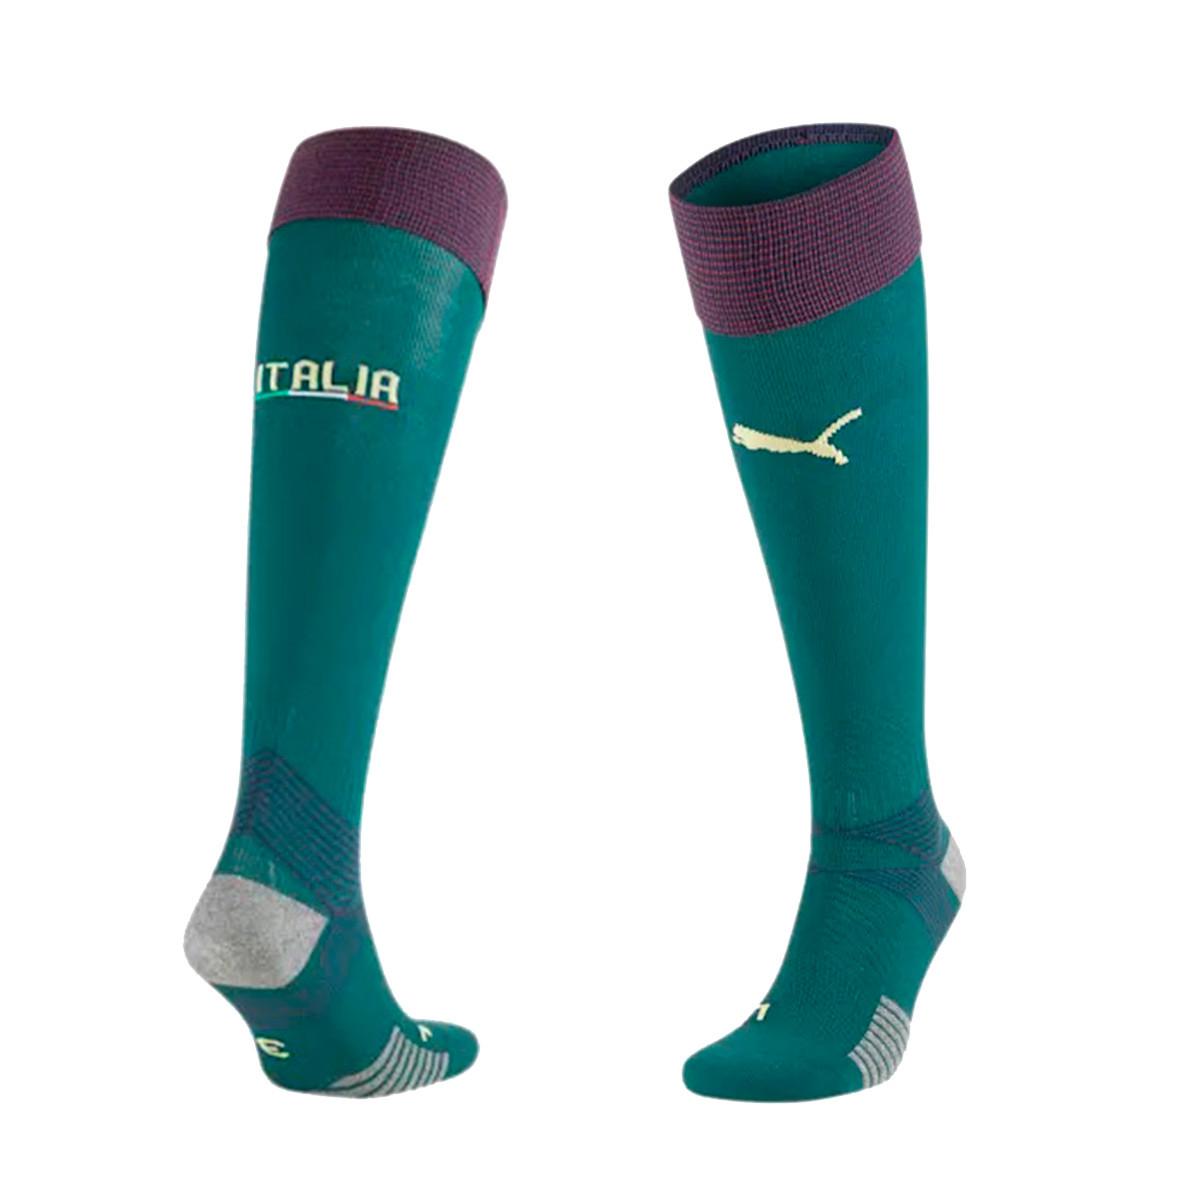 PUMA Team FIGC Third Replica Socks